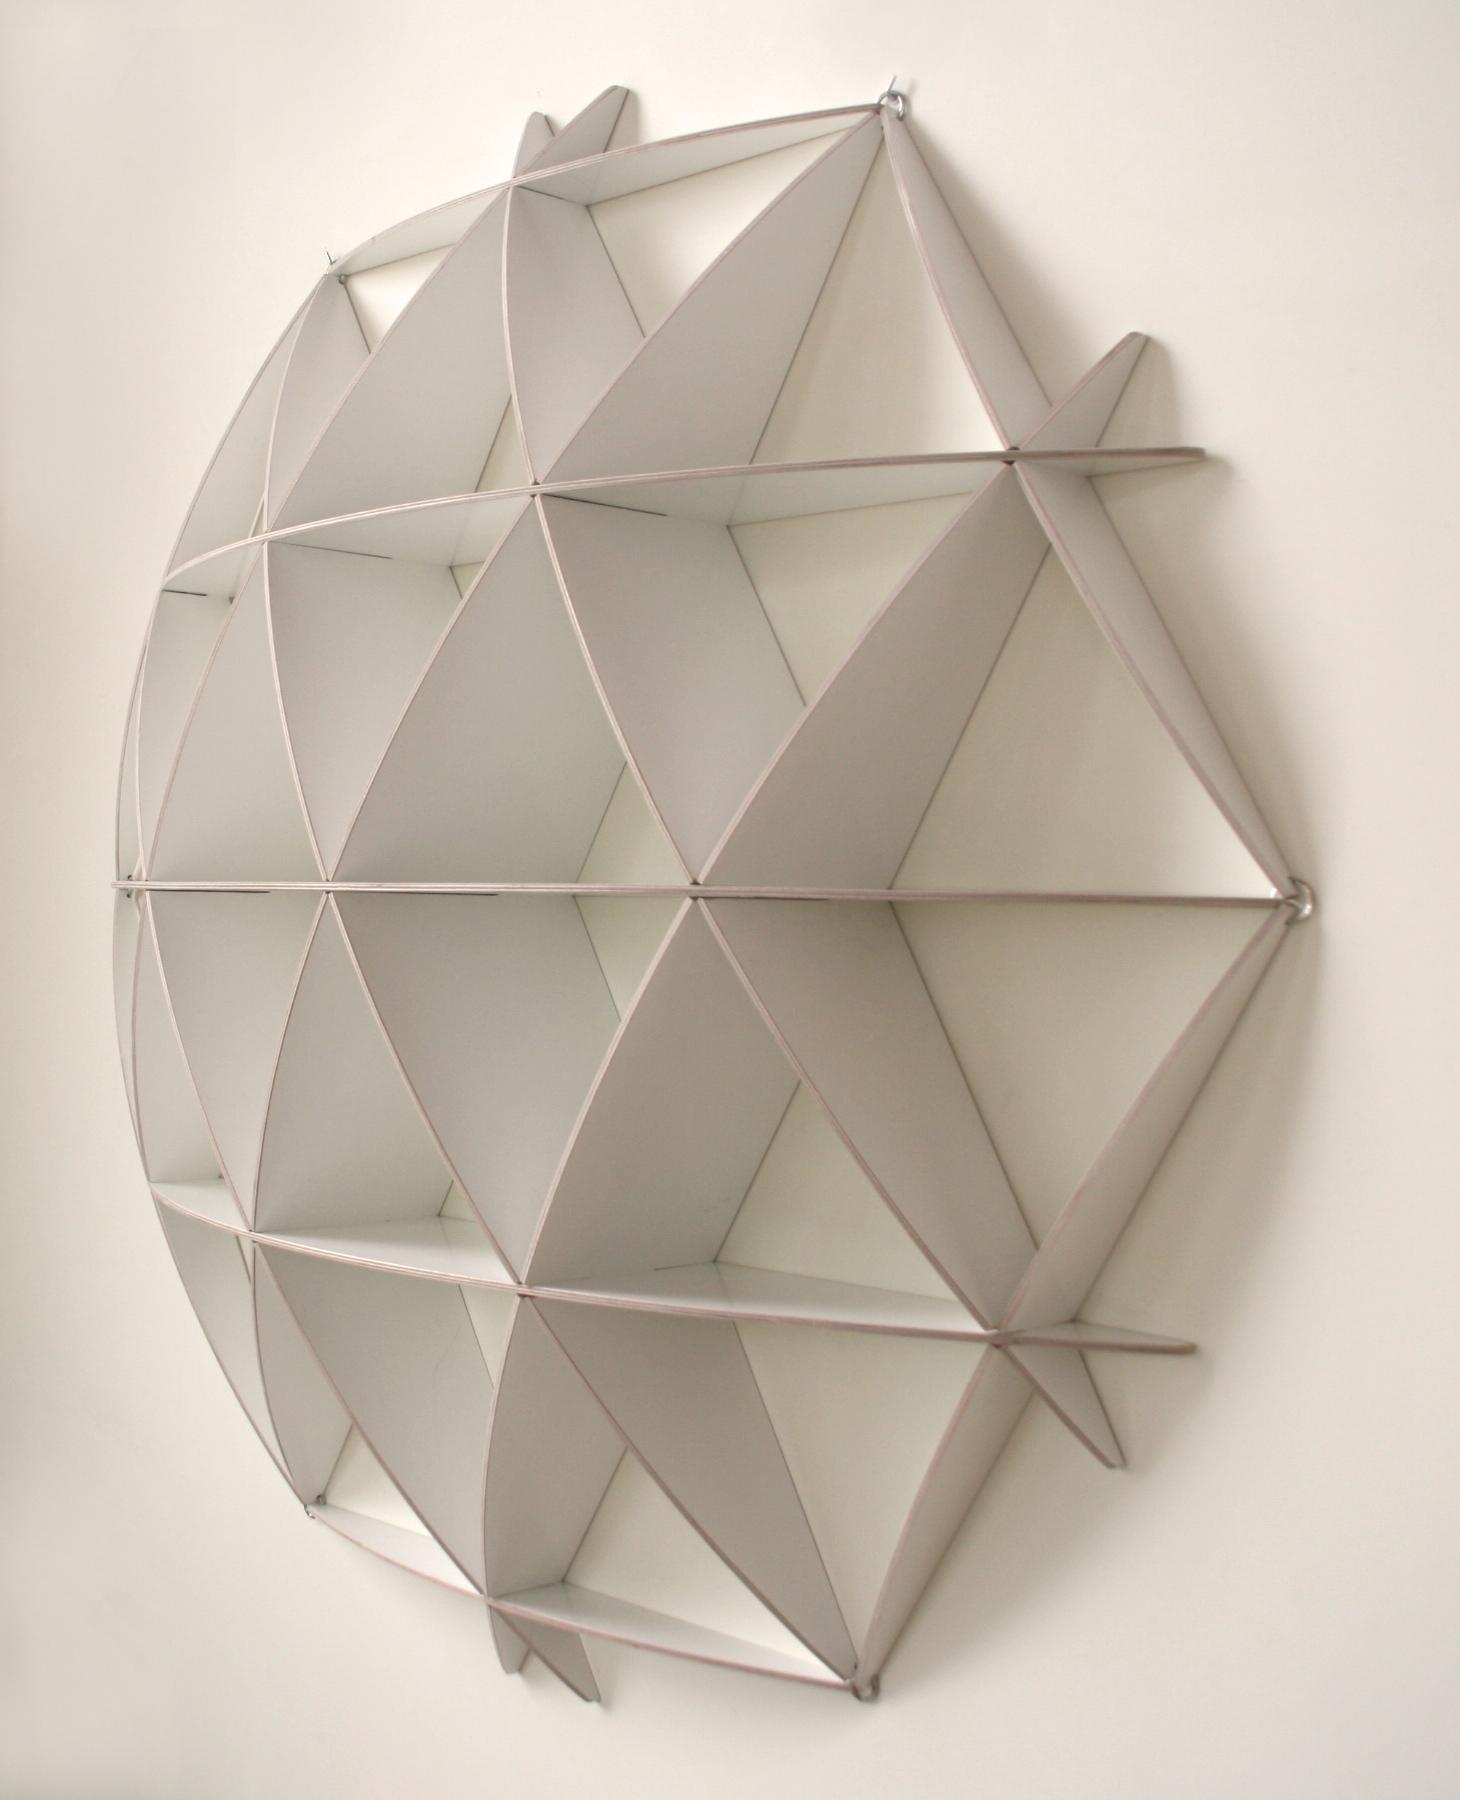 wandregal comb rund wei nordisches design. Black Bedroom Furniture Sets. Home Design Ideas